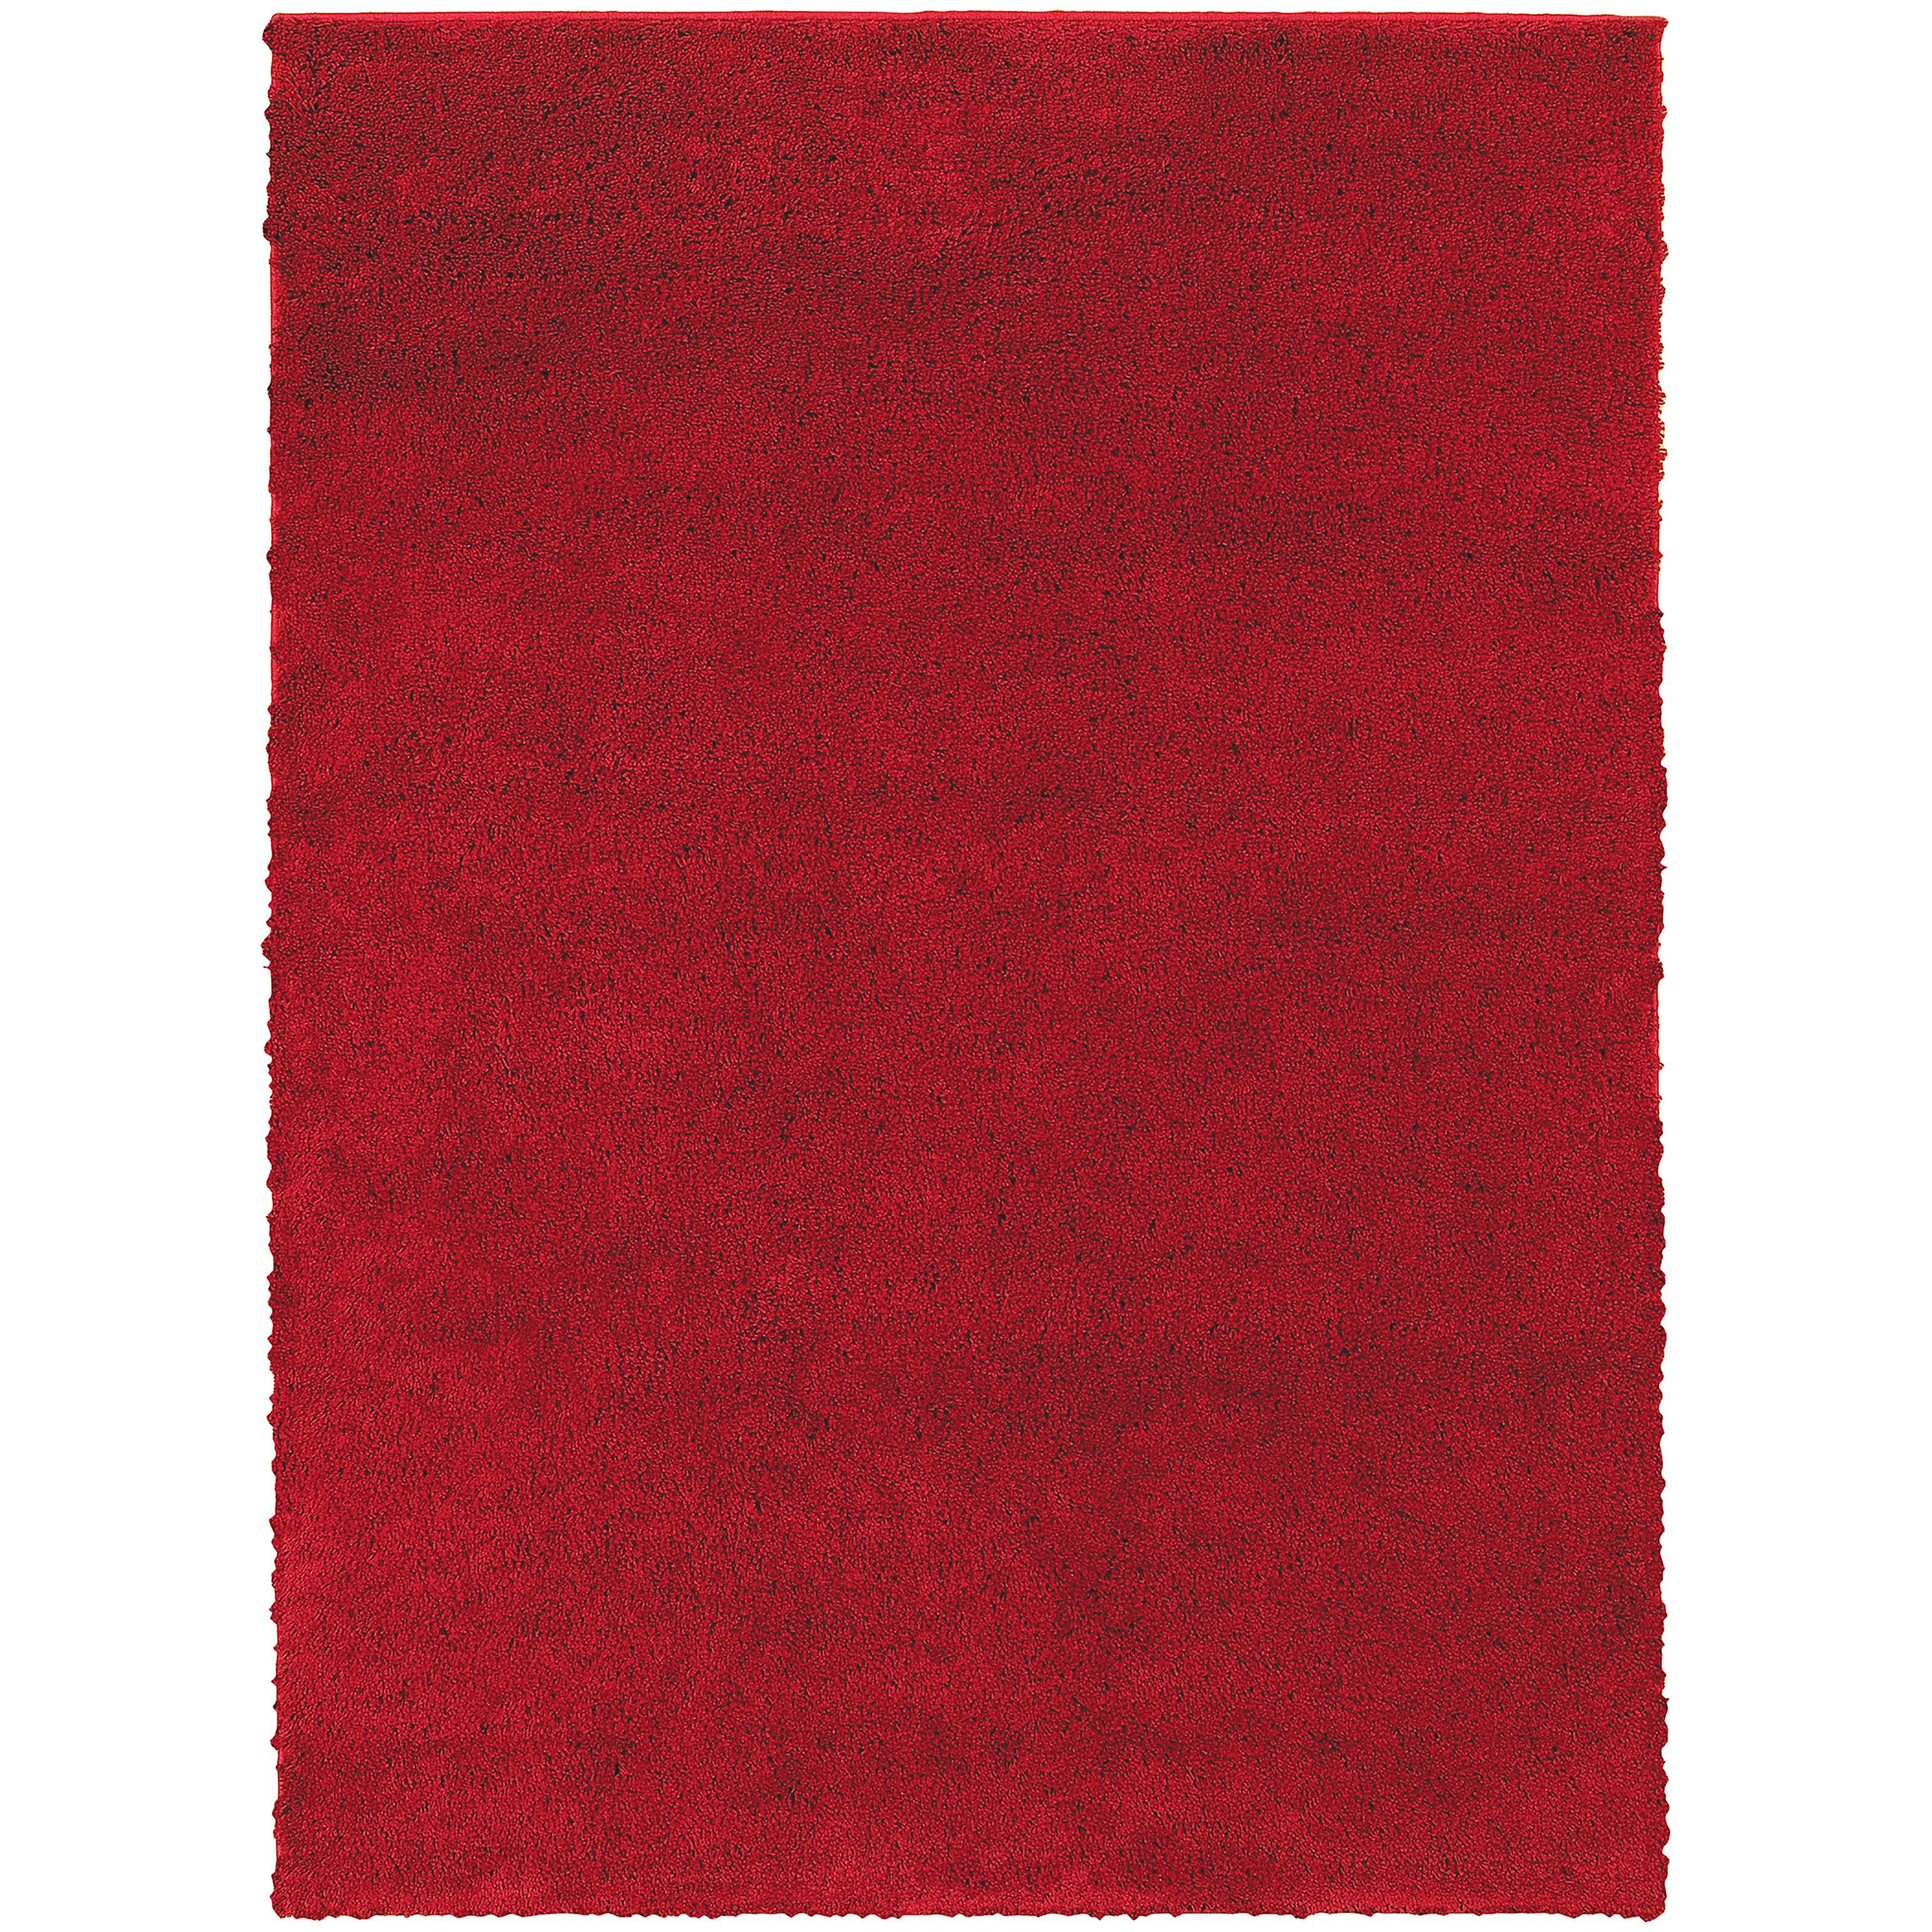 "Oriental Weavers Impressions 7'10"" X 10' 0"" Rug - Item Number: I84600240305ST"